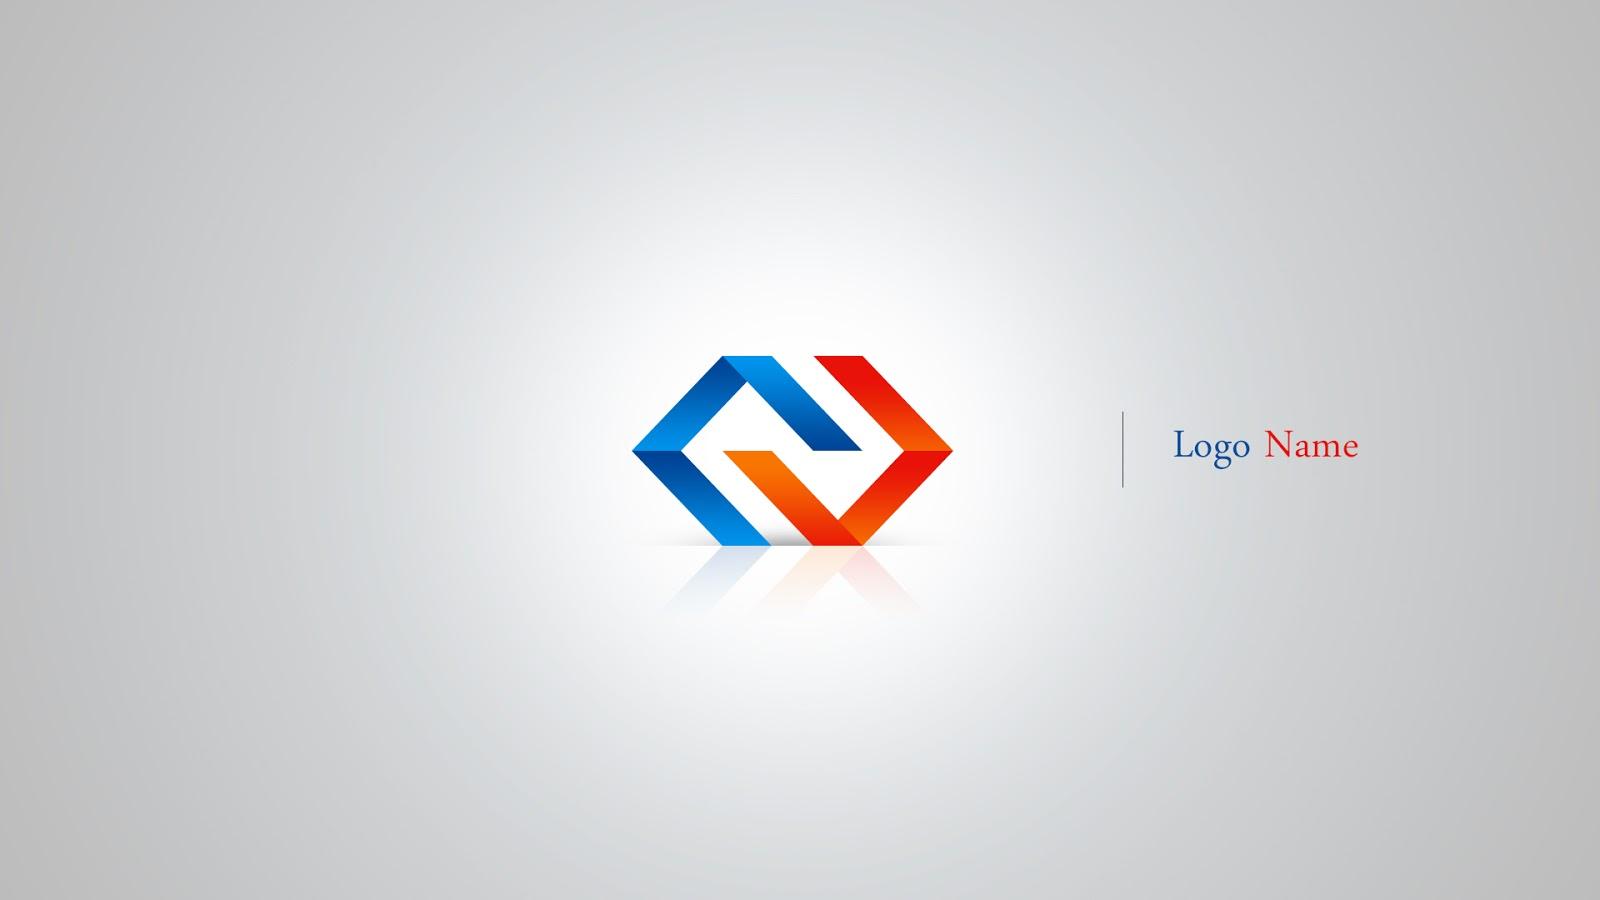 AFAR FRIEND: How to Make Logo.